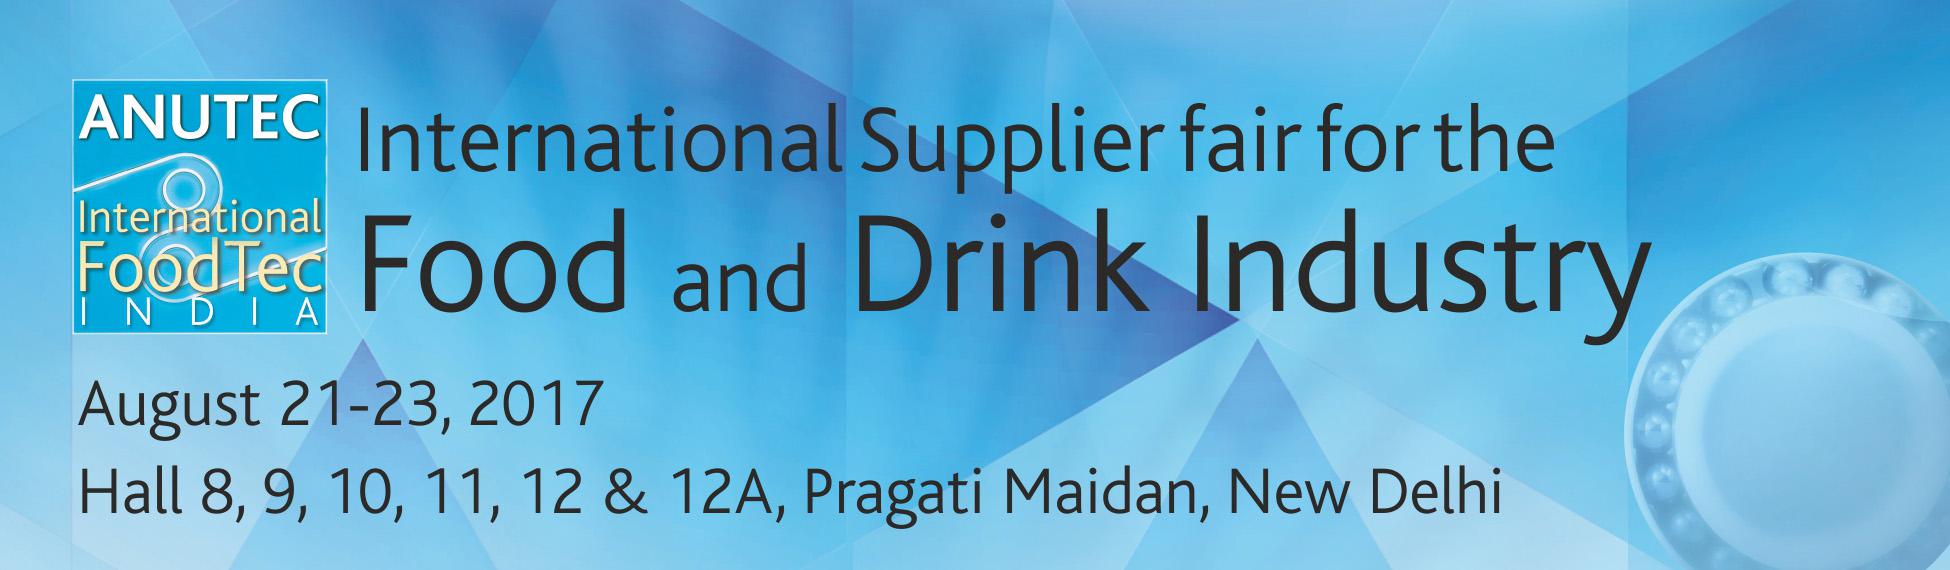 ANUTEC- International FoodTec India